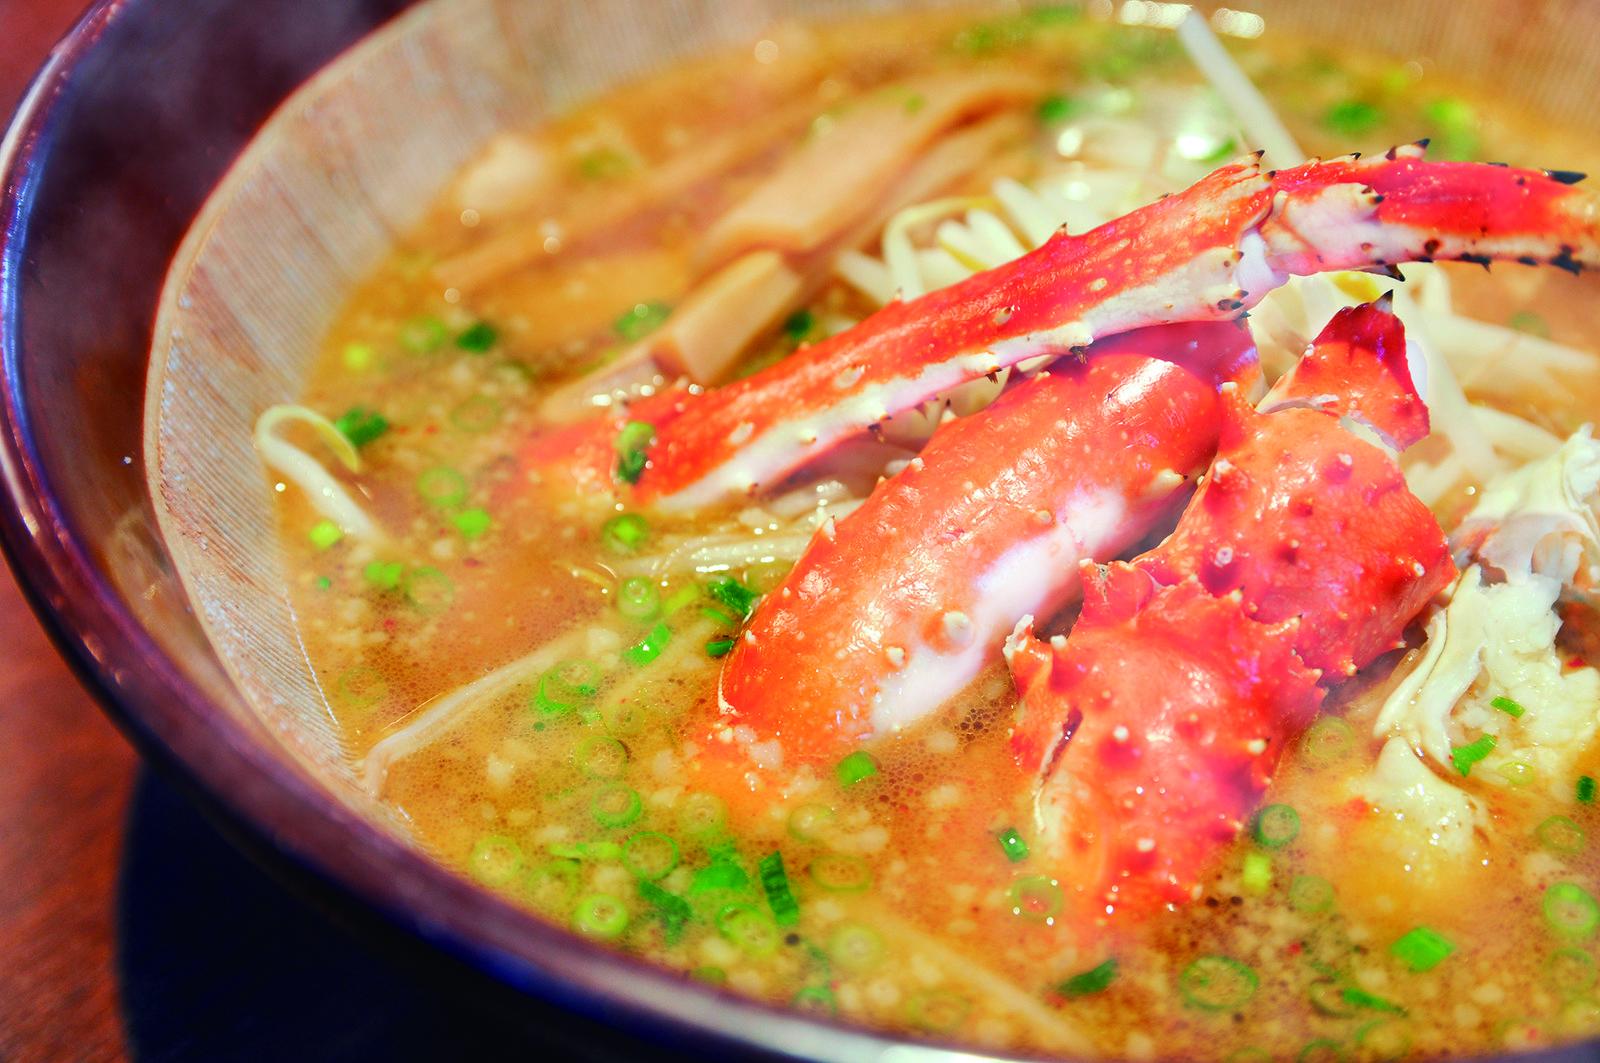 kani crab ramen hanazono 308 restaurant cafe